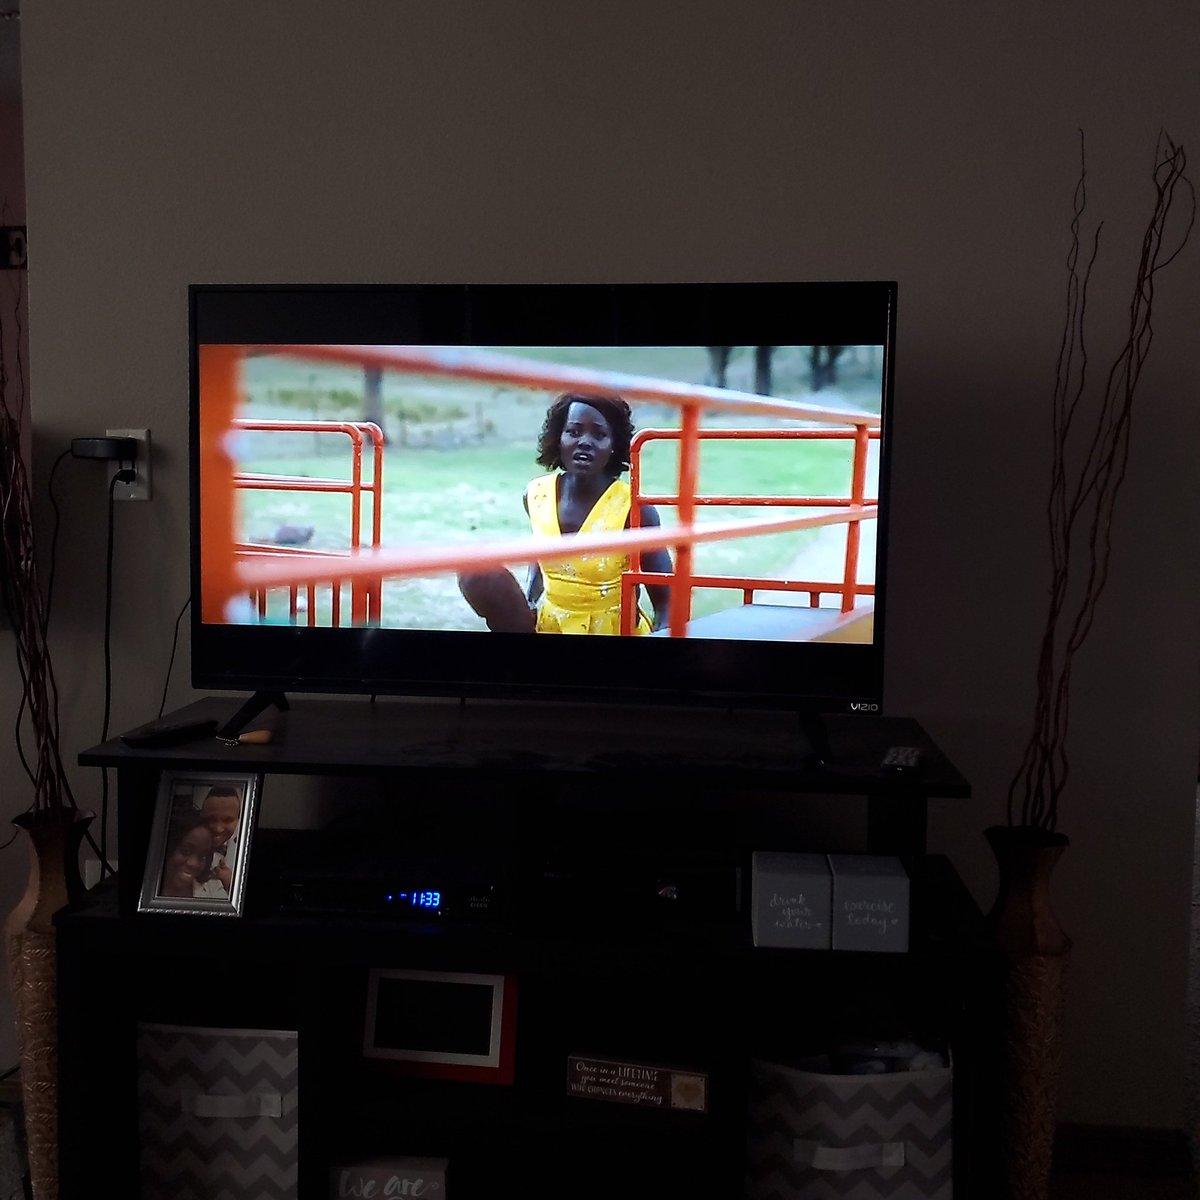 Lupita Nyong'o can act her ass off. #Littlemonsters #Hulu #Glossylipsalwayspic.twitter.com/cdqyiWFpM1